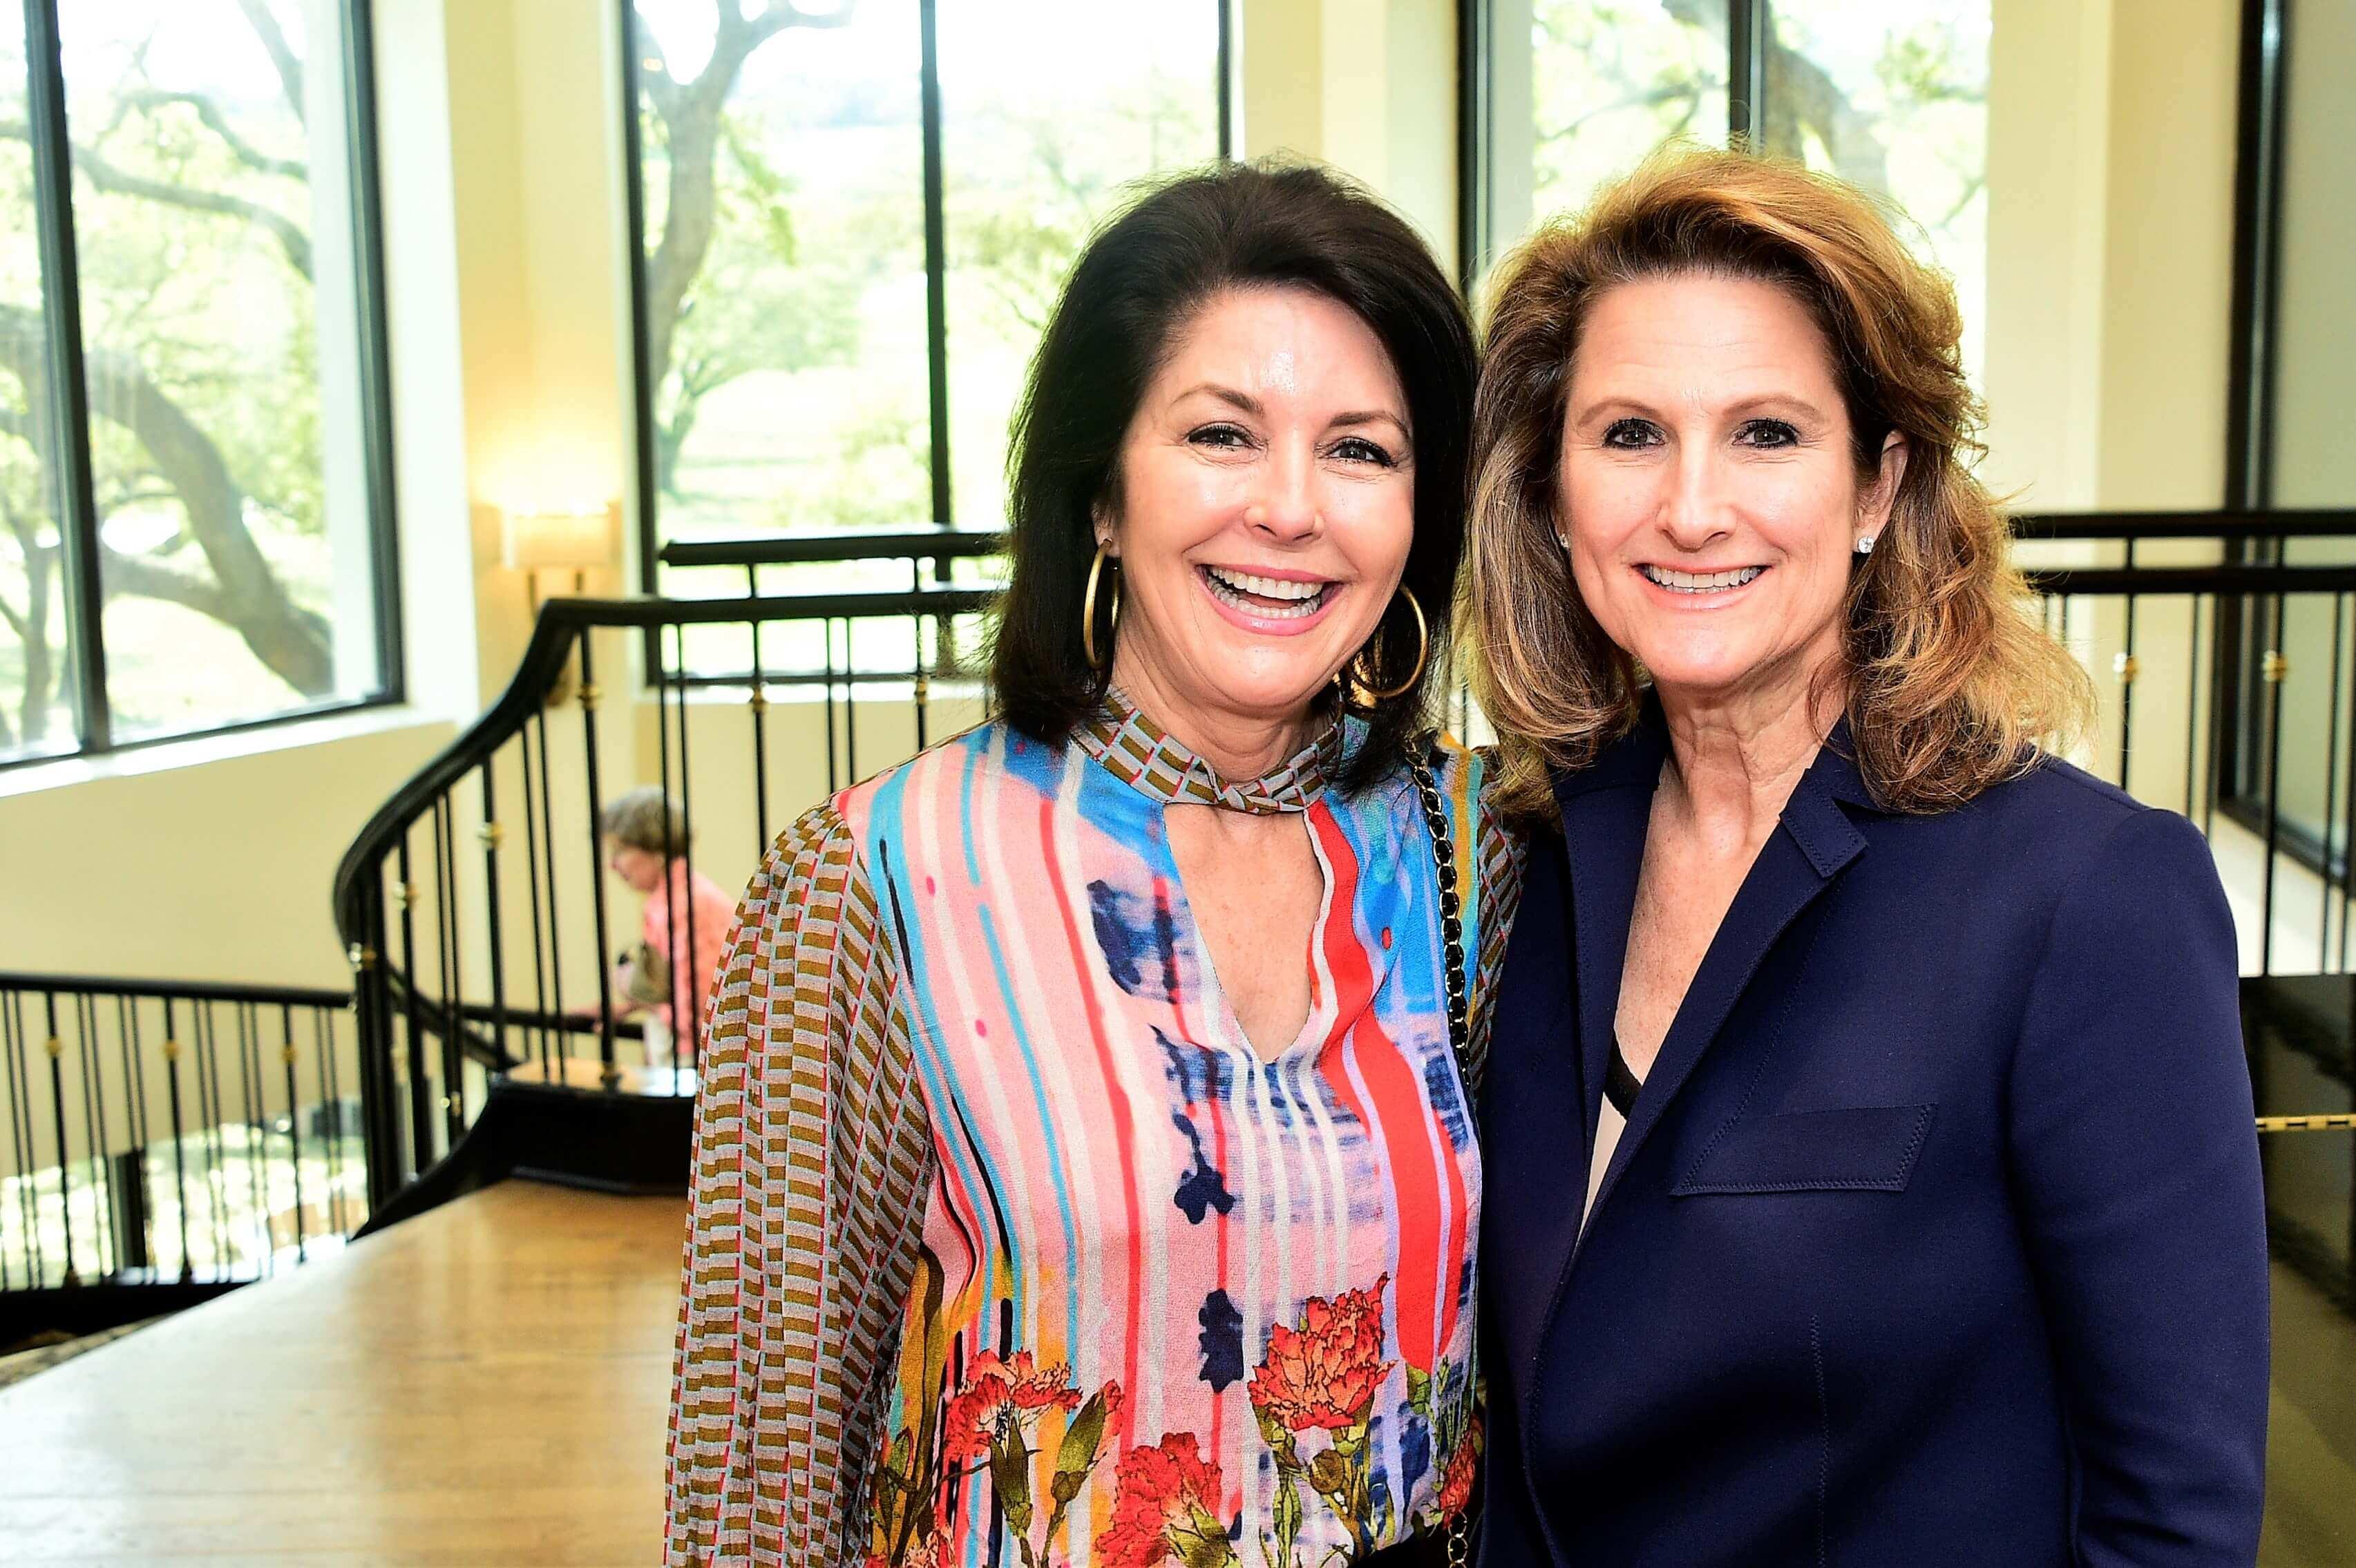 Sandra Wright and Julie Allen